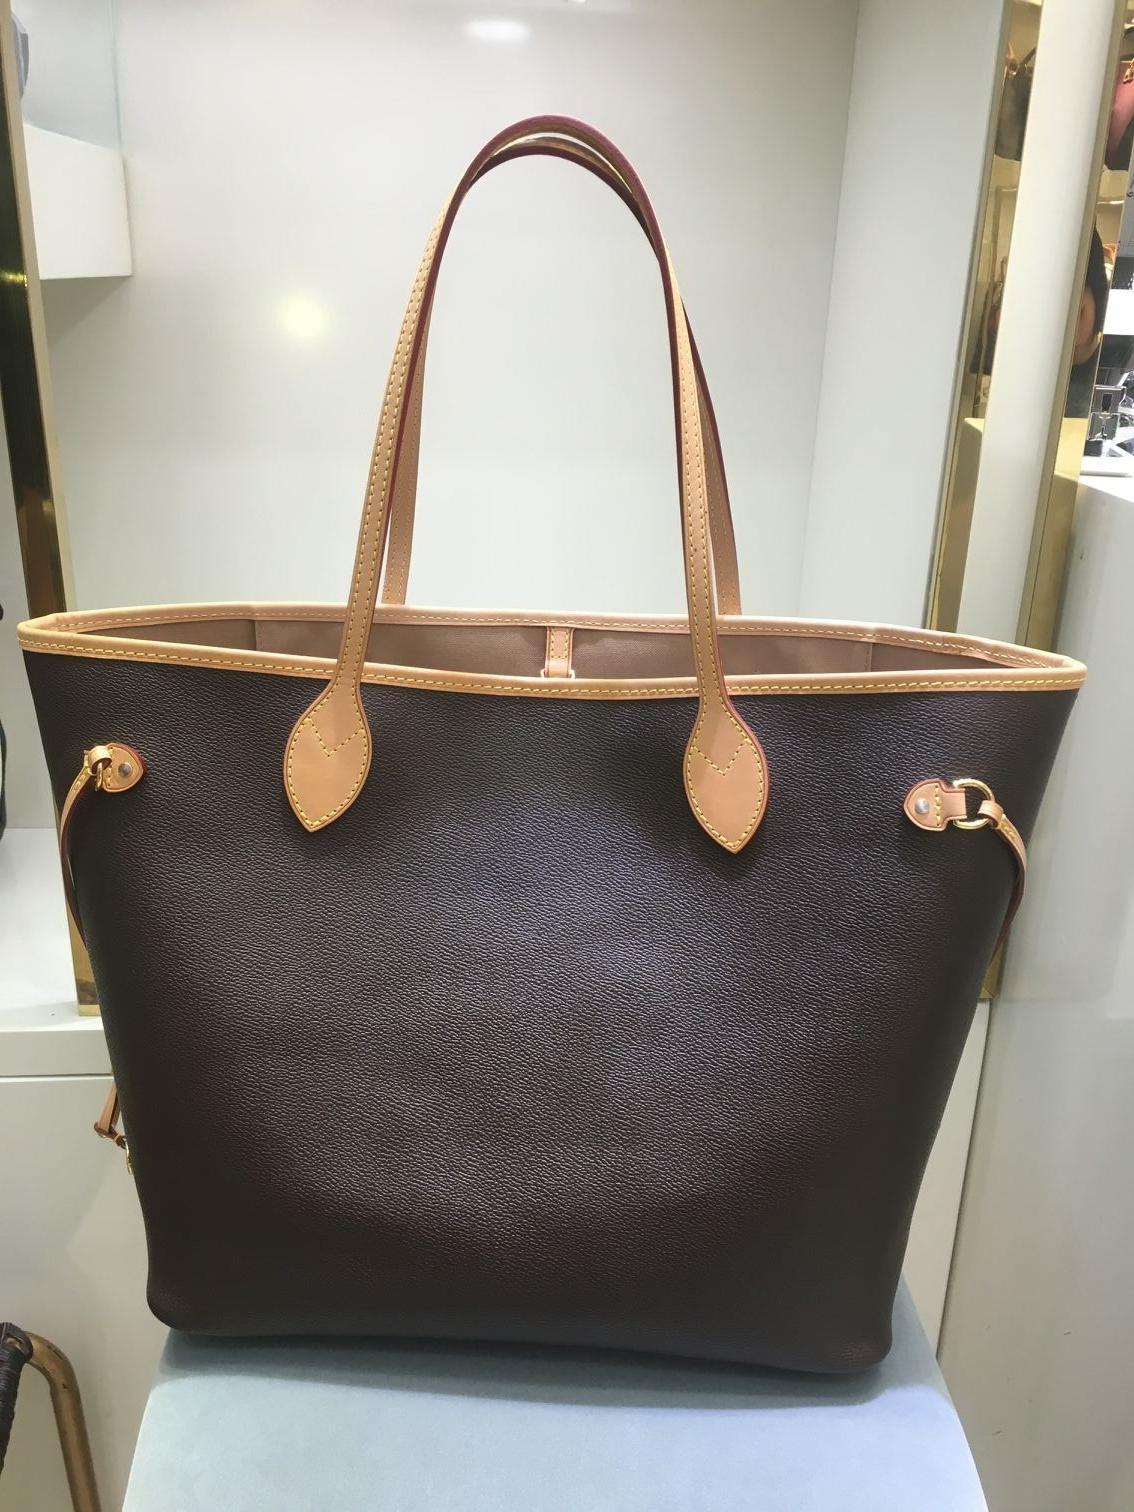 Top Brand Totes Real Totes Bag Bols Bags Bolsa de diseñador 8 para mujer Cuero genuino Mujeres Hombro Cadena de Hombro Mm Carteras Color Classic G Awmk